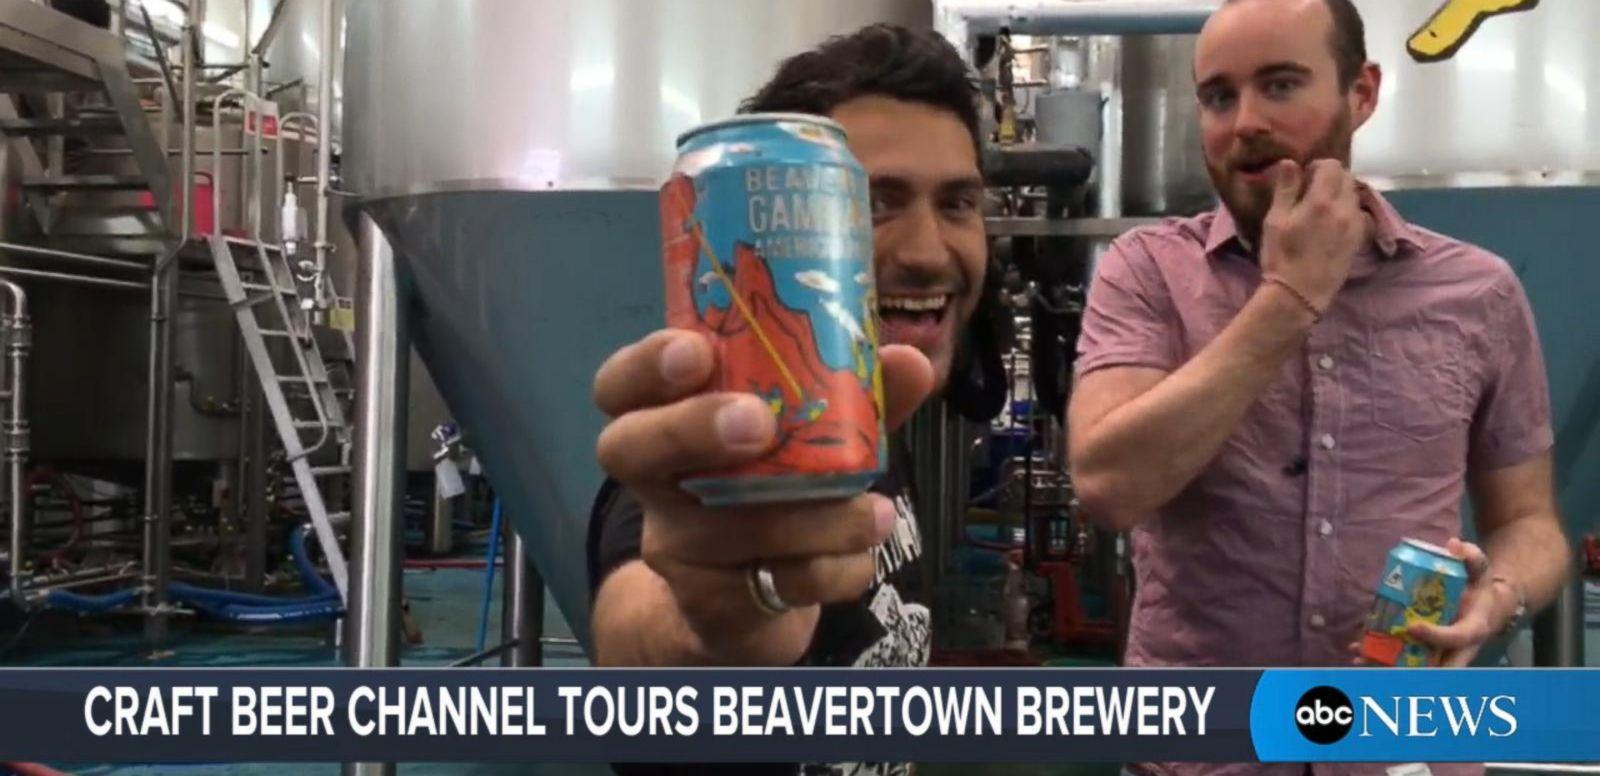 VIDEO: Inside Beavertown Brewery